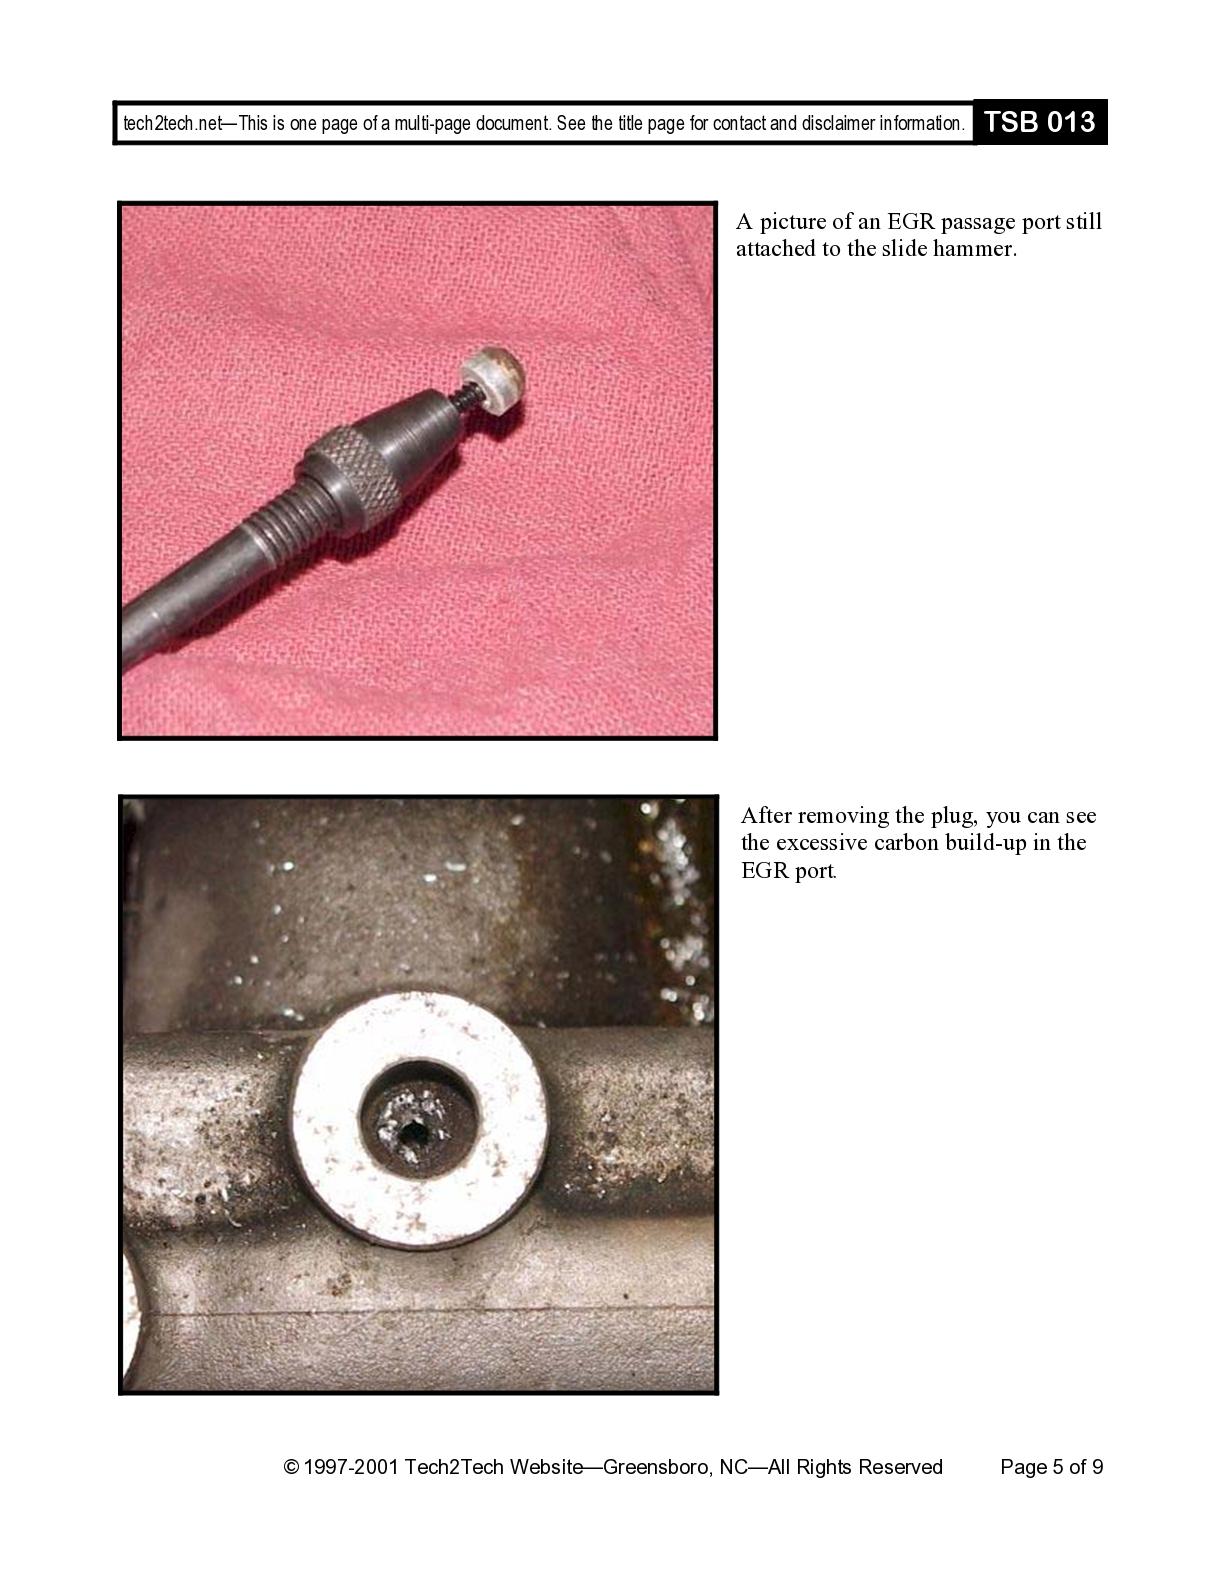 Abduls Place May 2011 P1361 2000 Honda Accord Source Tech2techcom